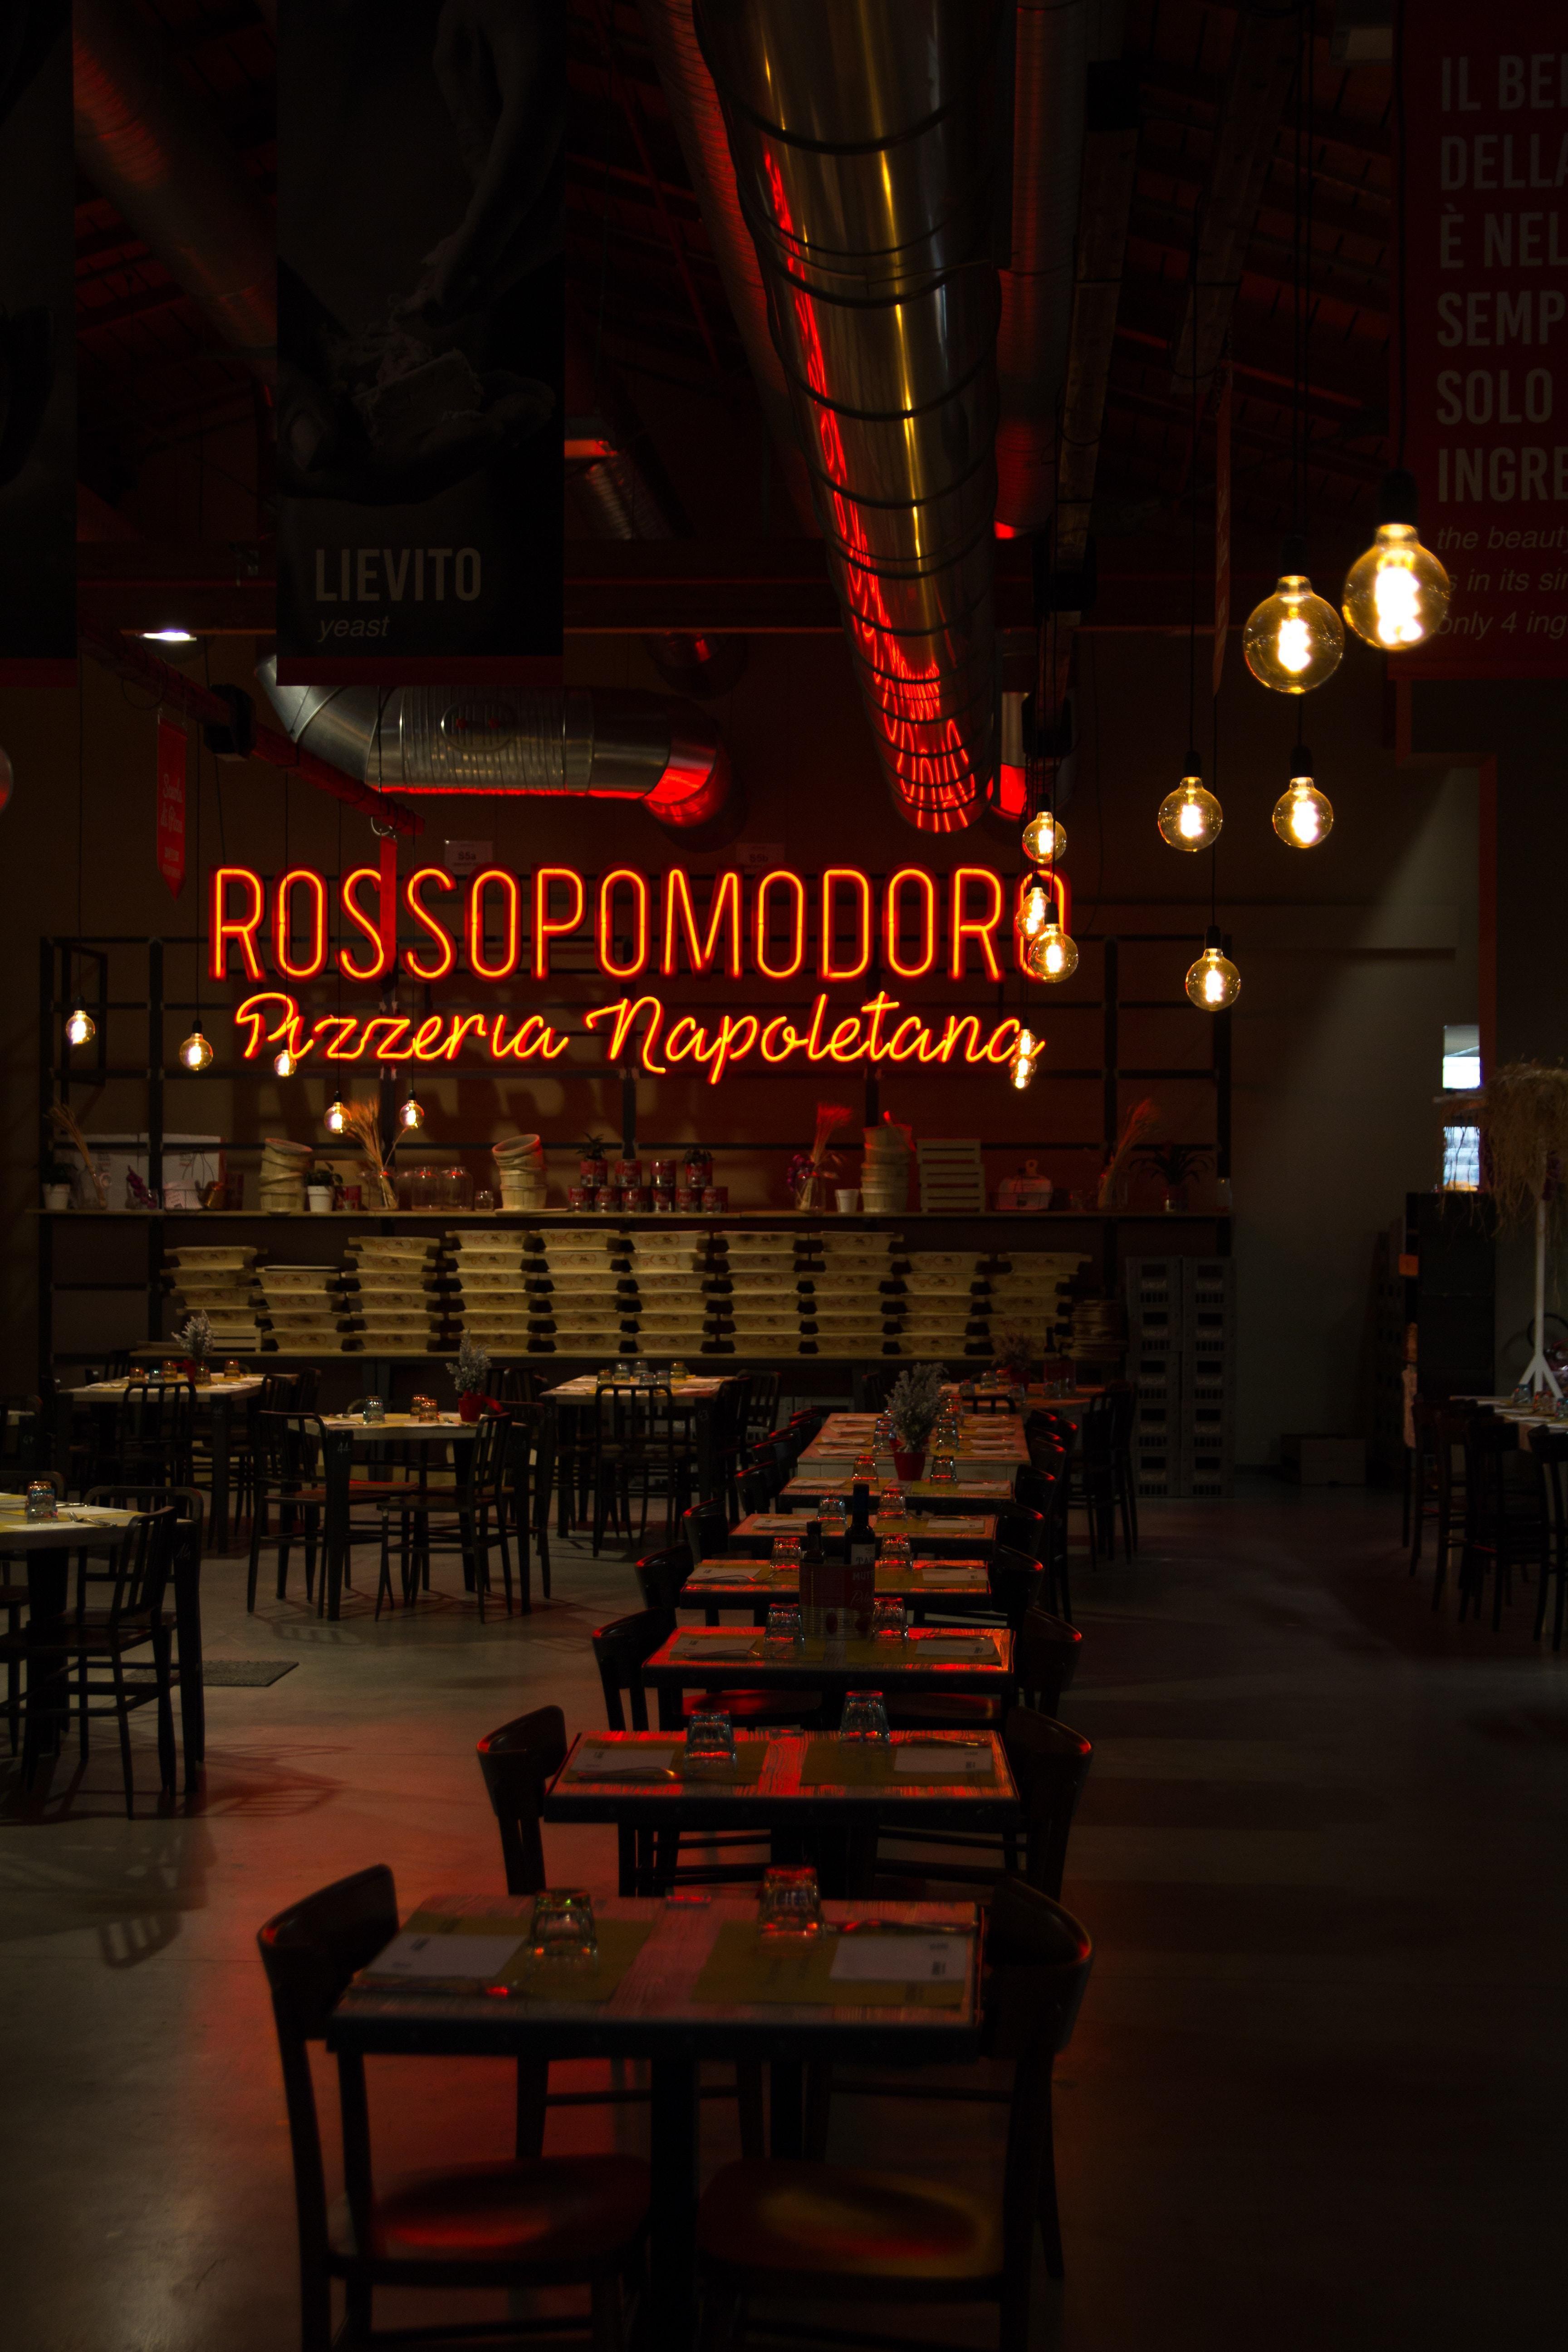 Rossopomodor pizzaria neon light sign